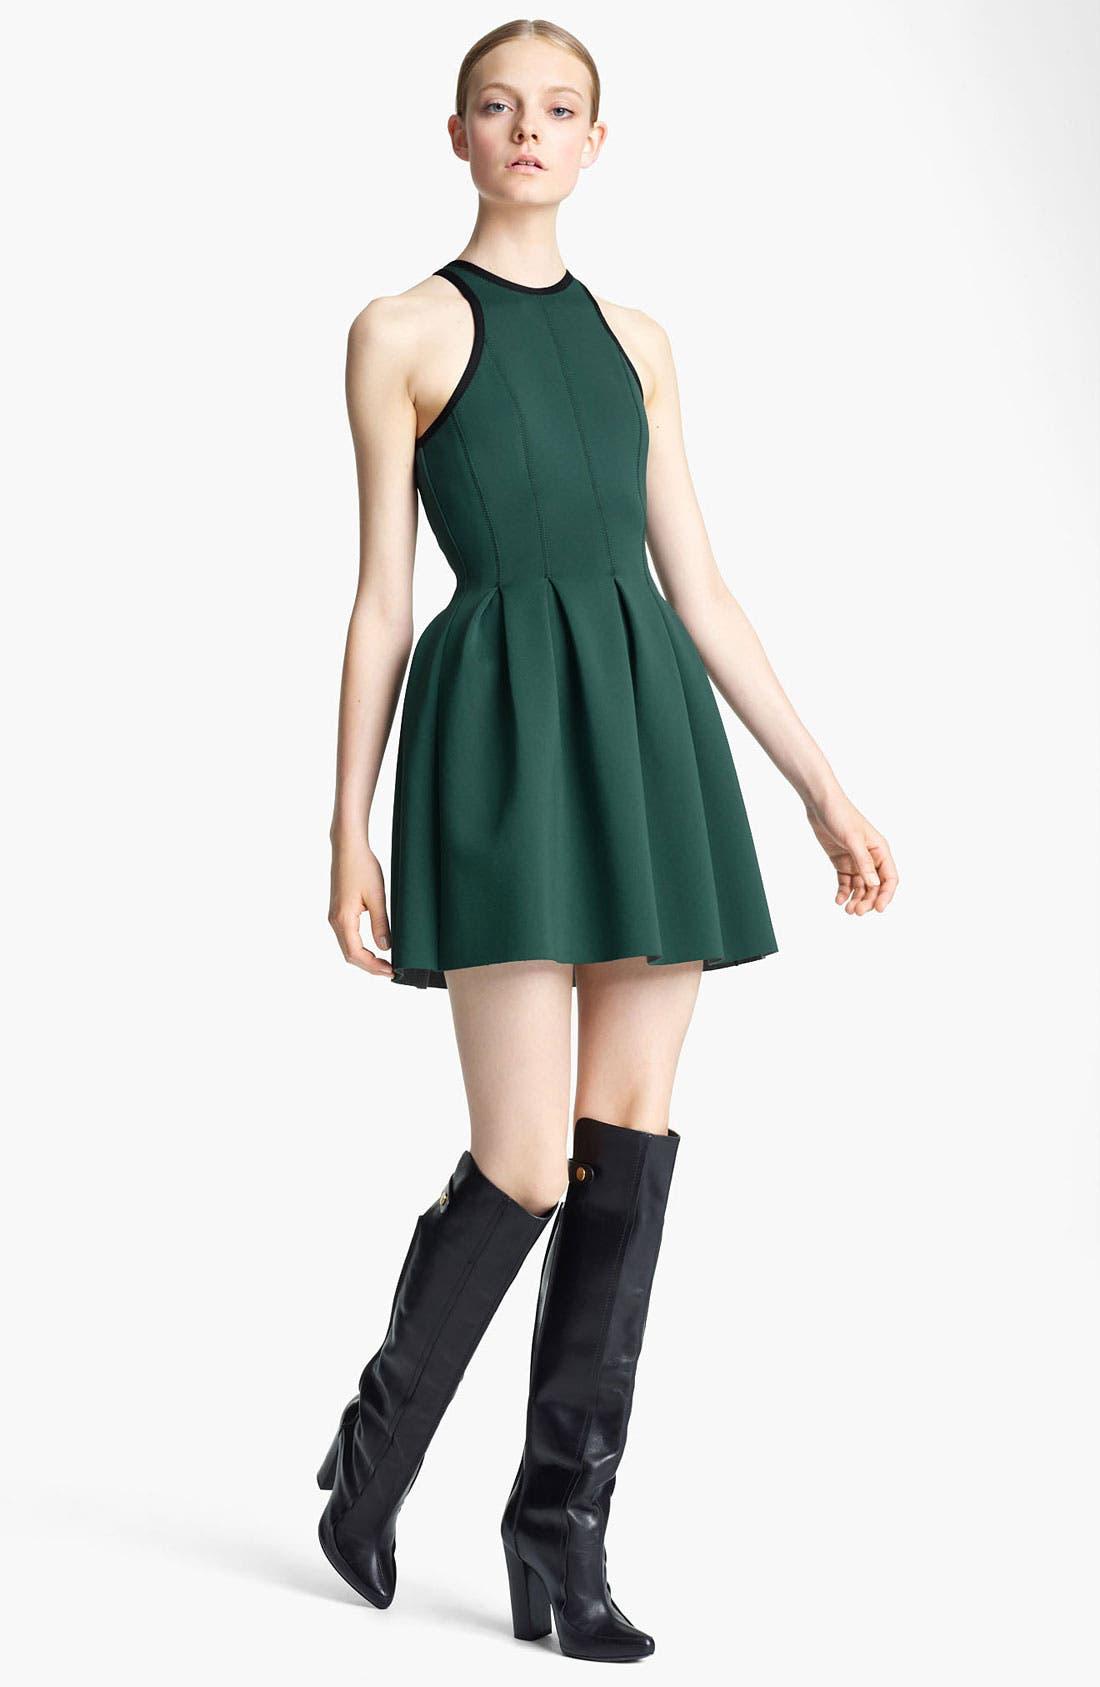 Alternate Image 1 Selected - T by Alexander Wang 'Neoprene' Pleated Dress